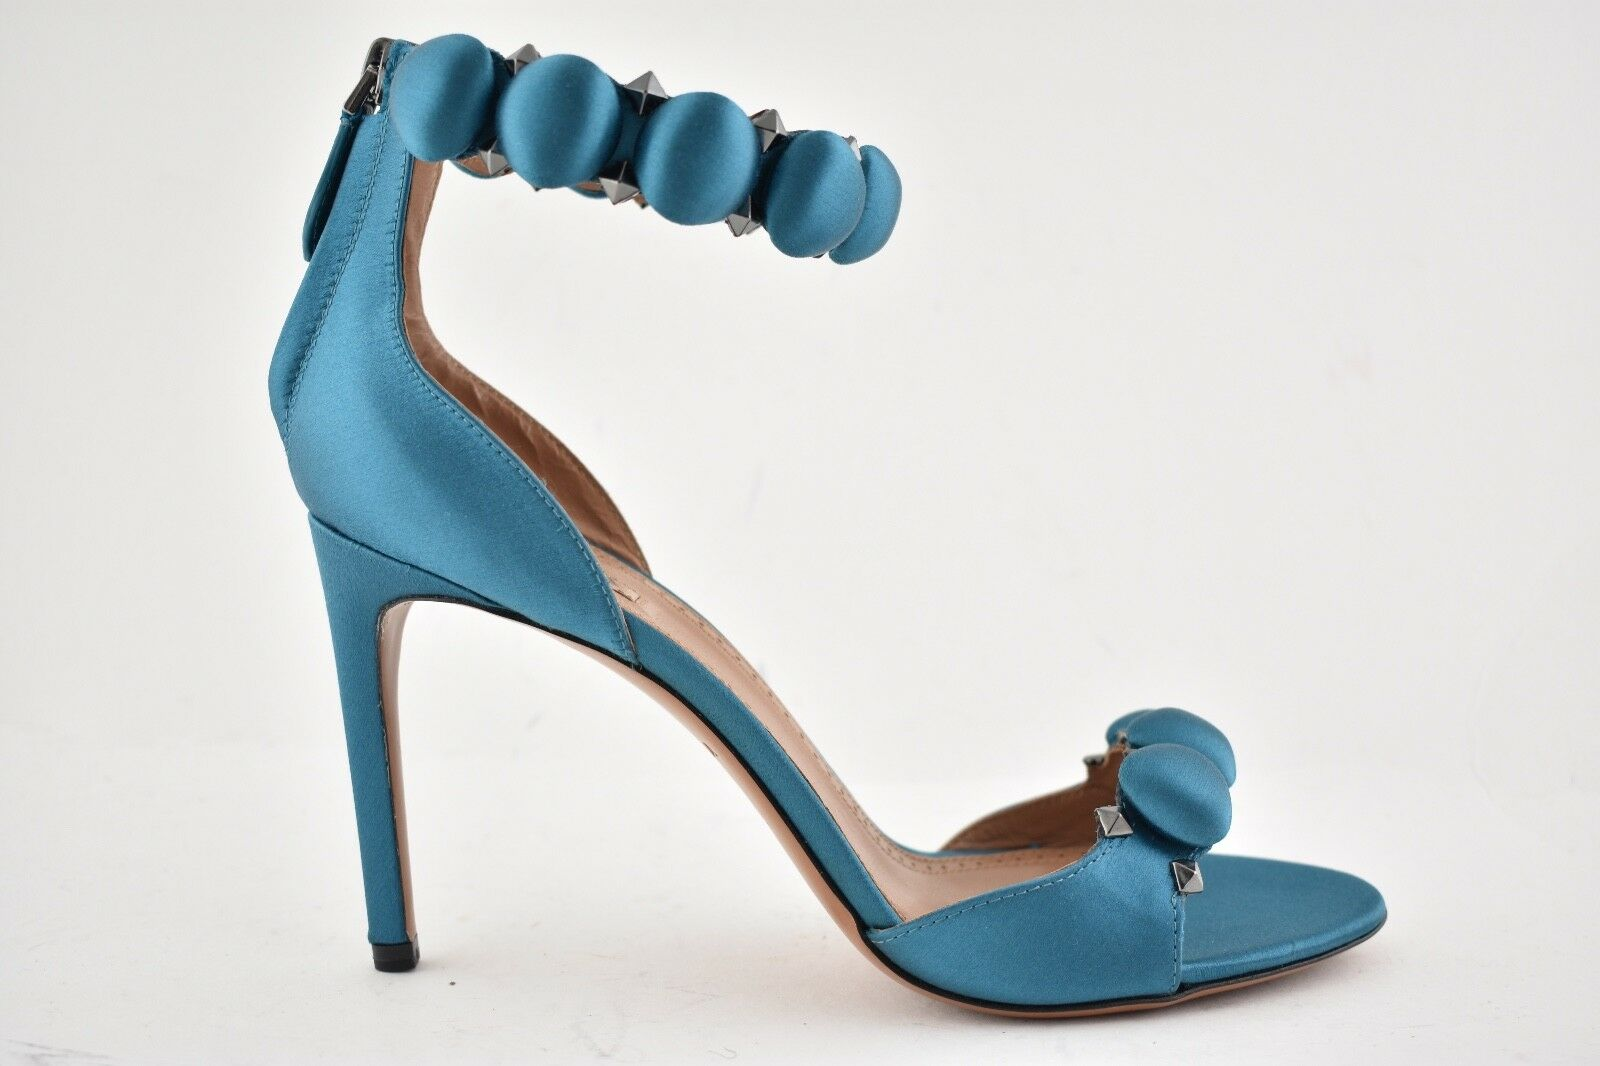 NIB Alaia Bombe 90mm bluee Canard Satin Studded Ankle Strap Sandal Heel Pump 39.5